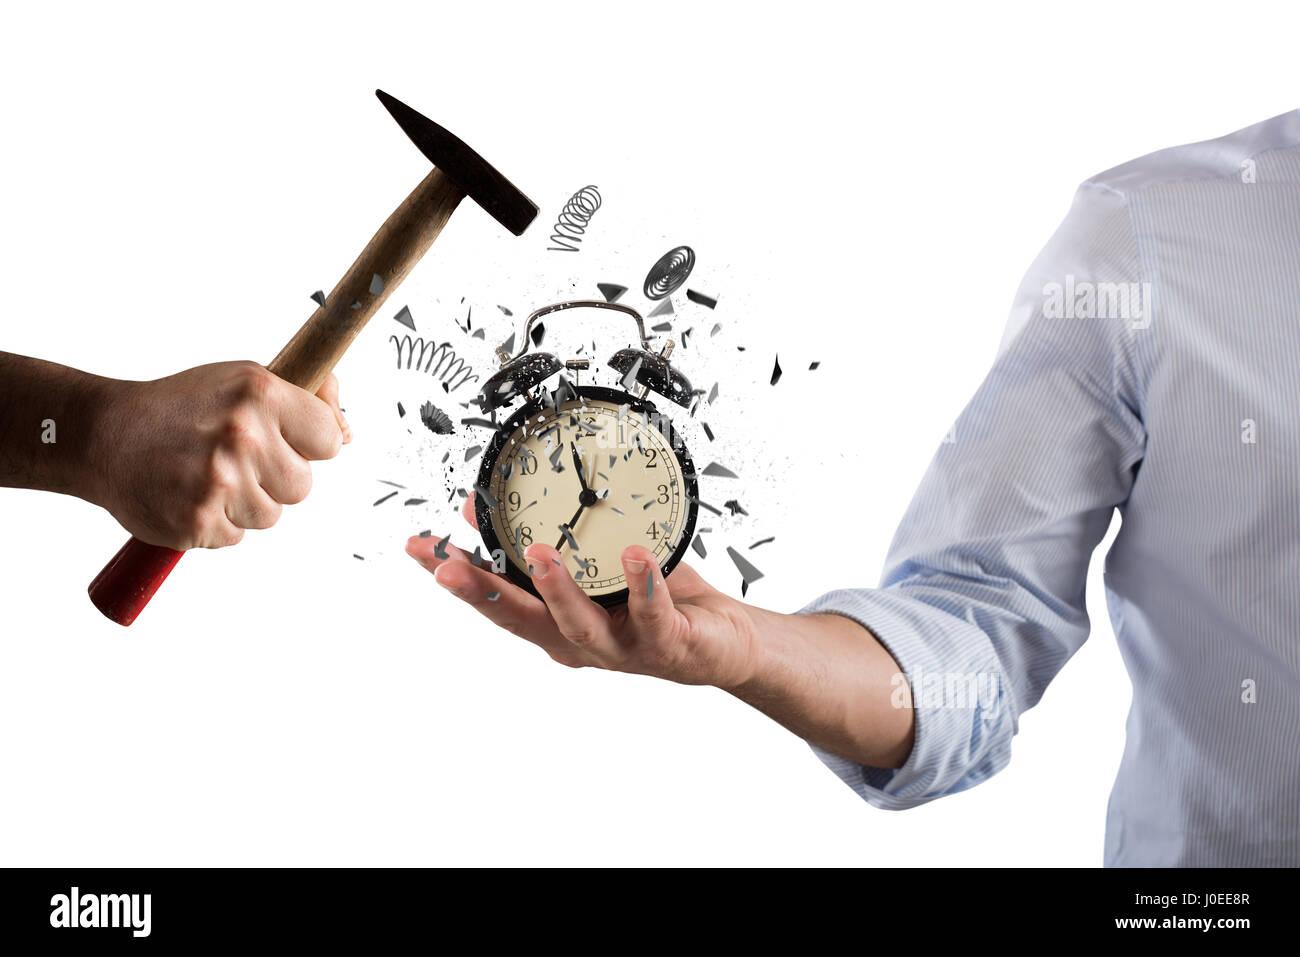 Alarm clock broken - Stock Image